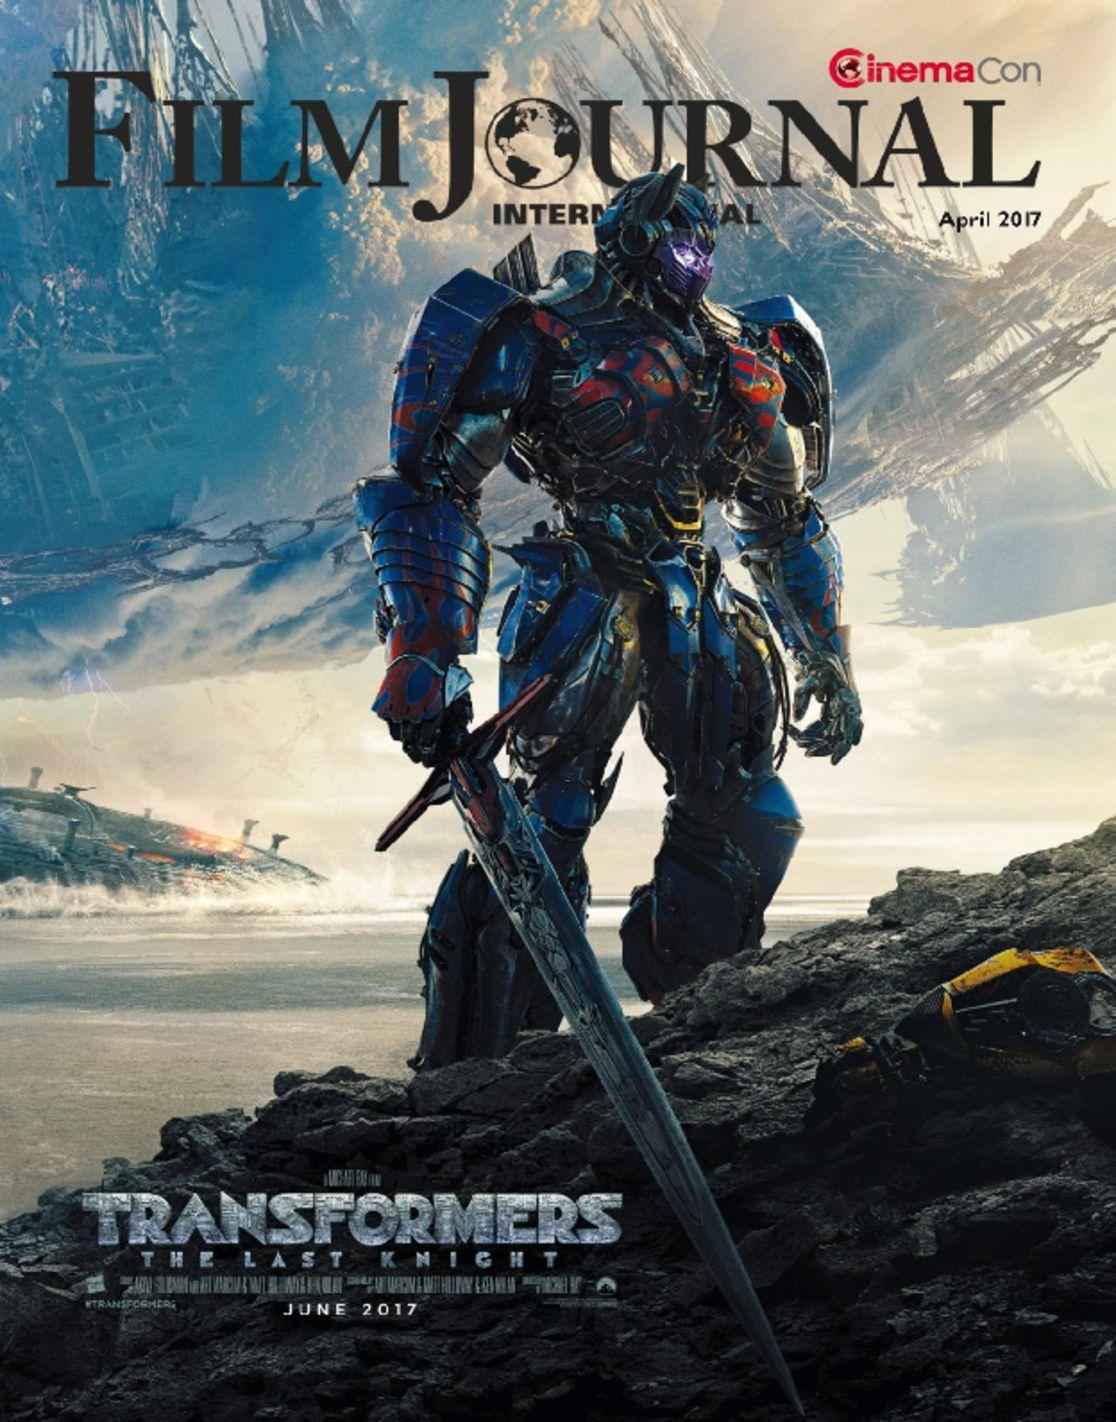 Film Journal International (Digital)